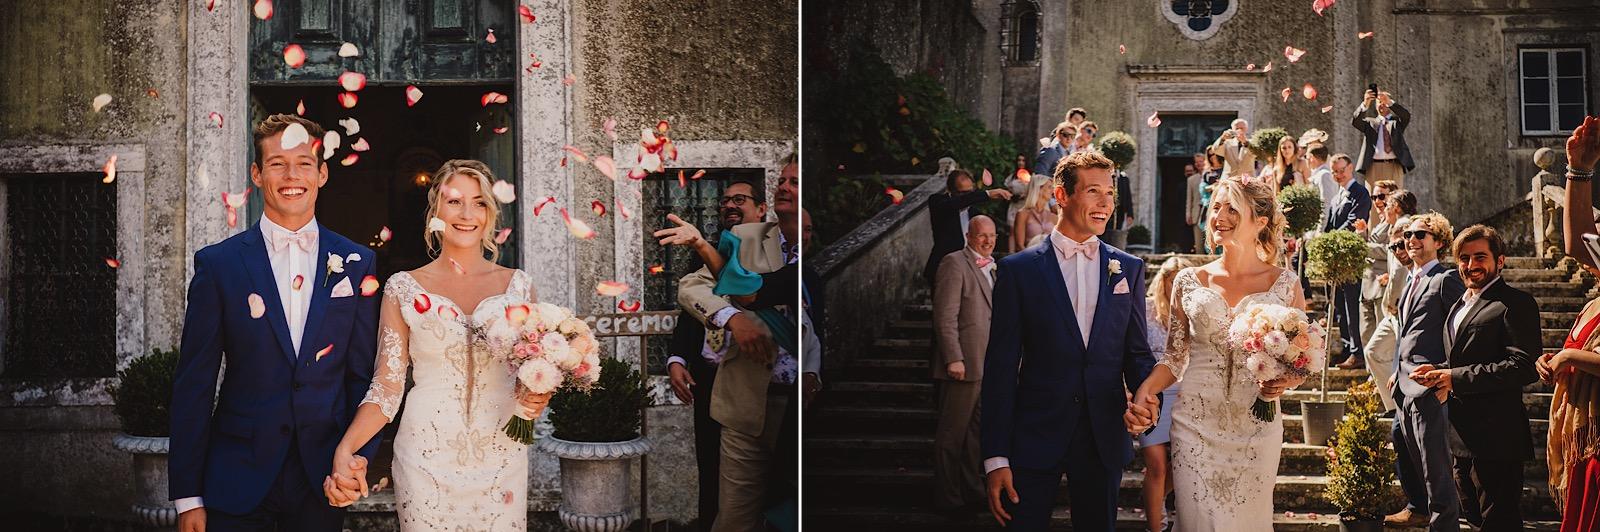 portugal_wedding_photographers0022